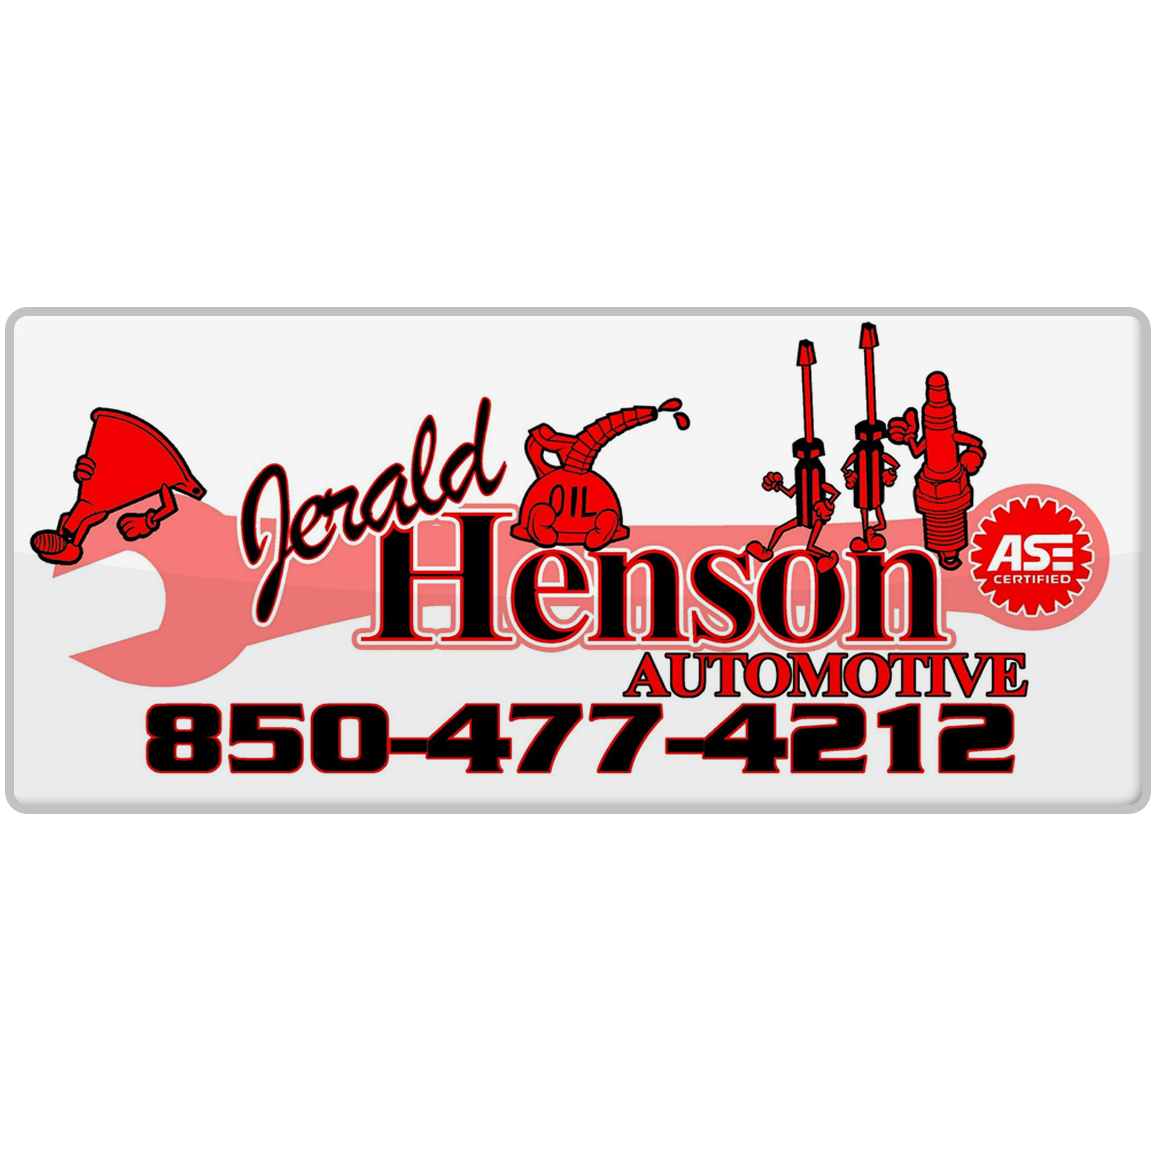 Jerald Henson Automotive, Inc - Pensacola, FL - General Auto Repair & Service